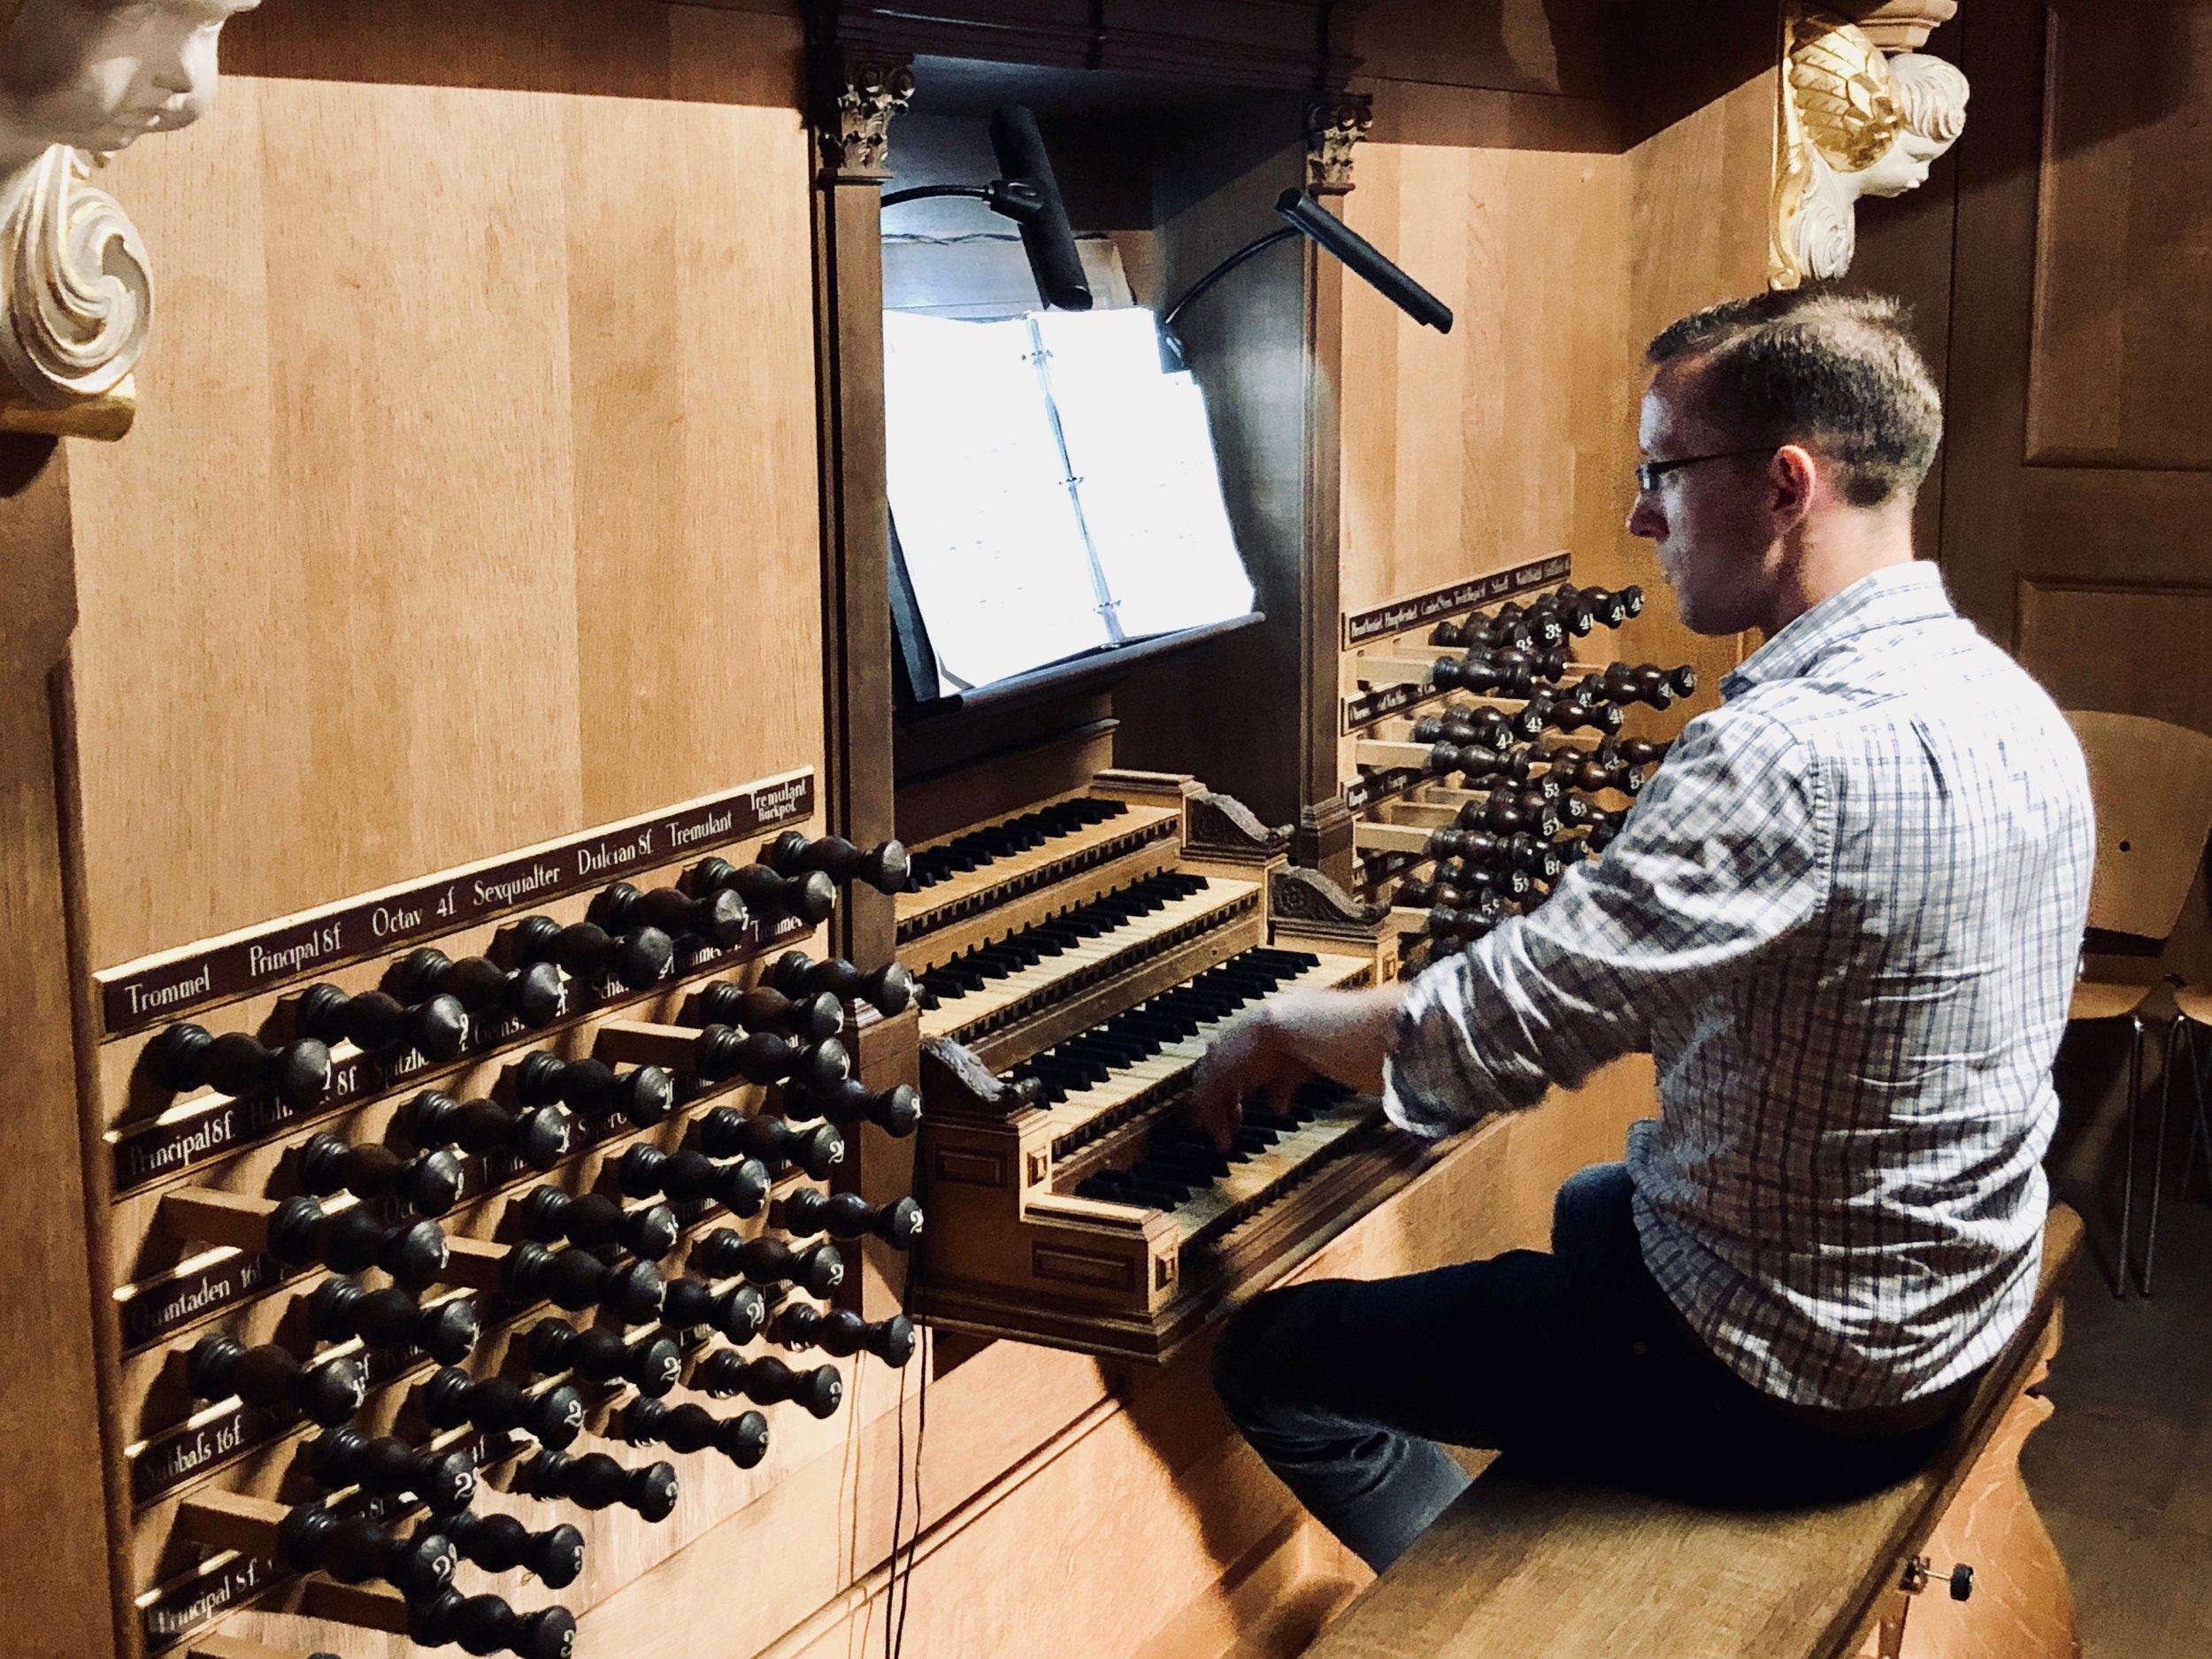 Christian Lane plays the 1693 Schnitger organ, St. Jacobi, Hamburg.